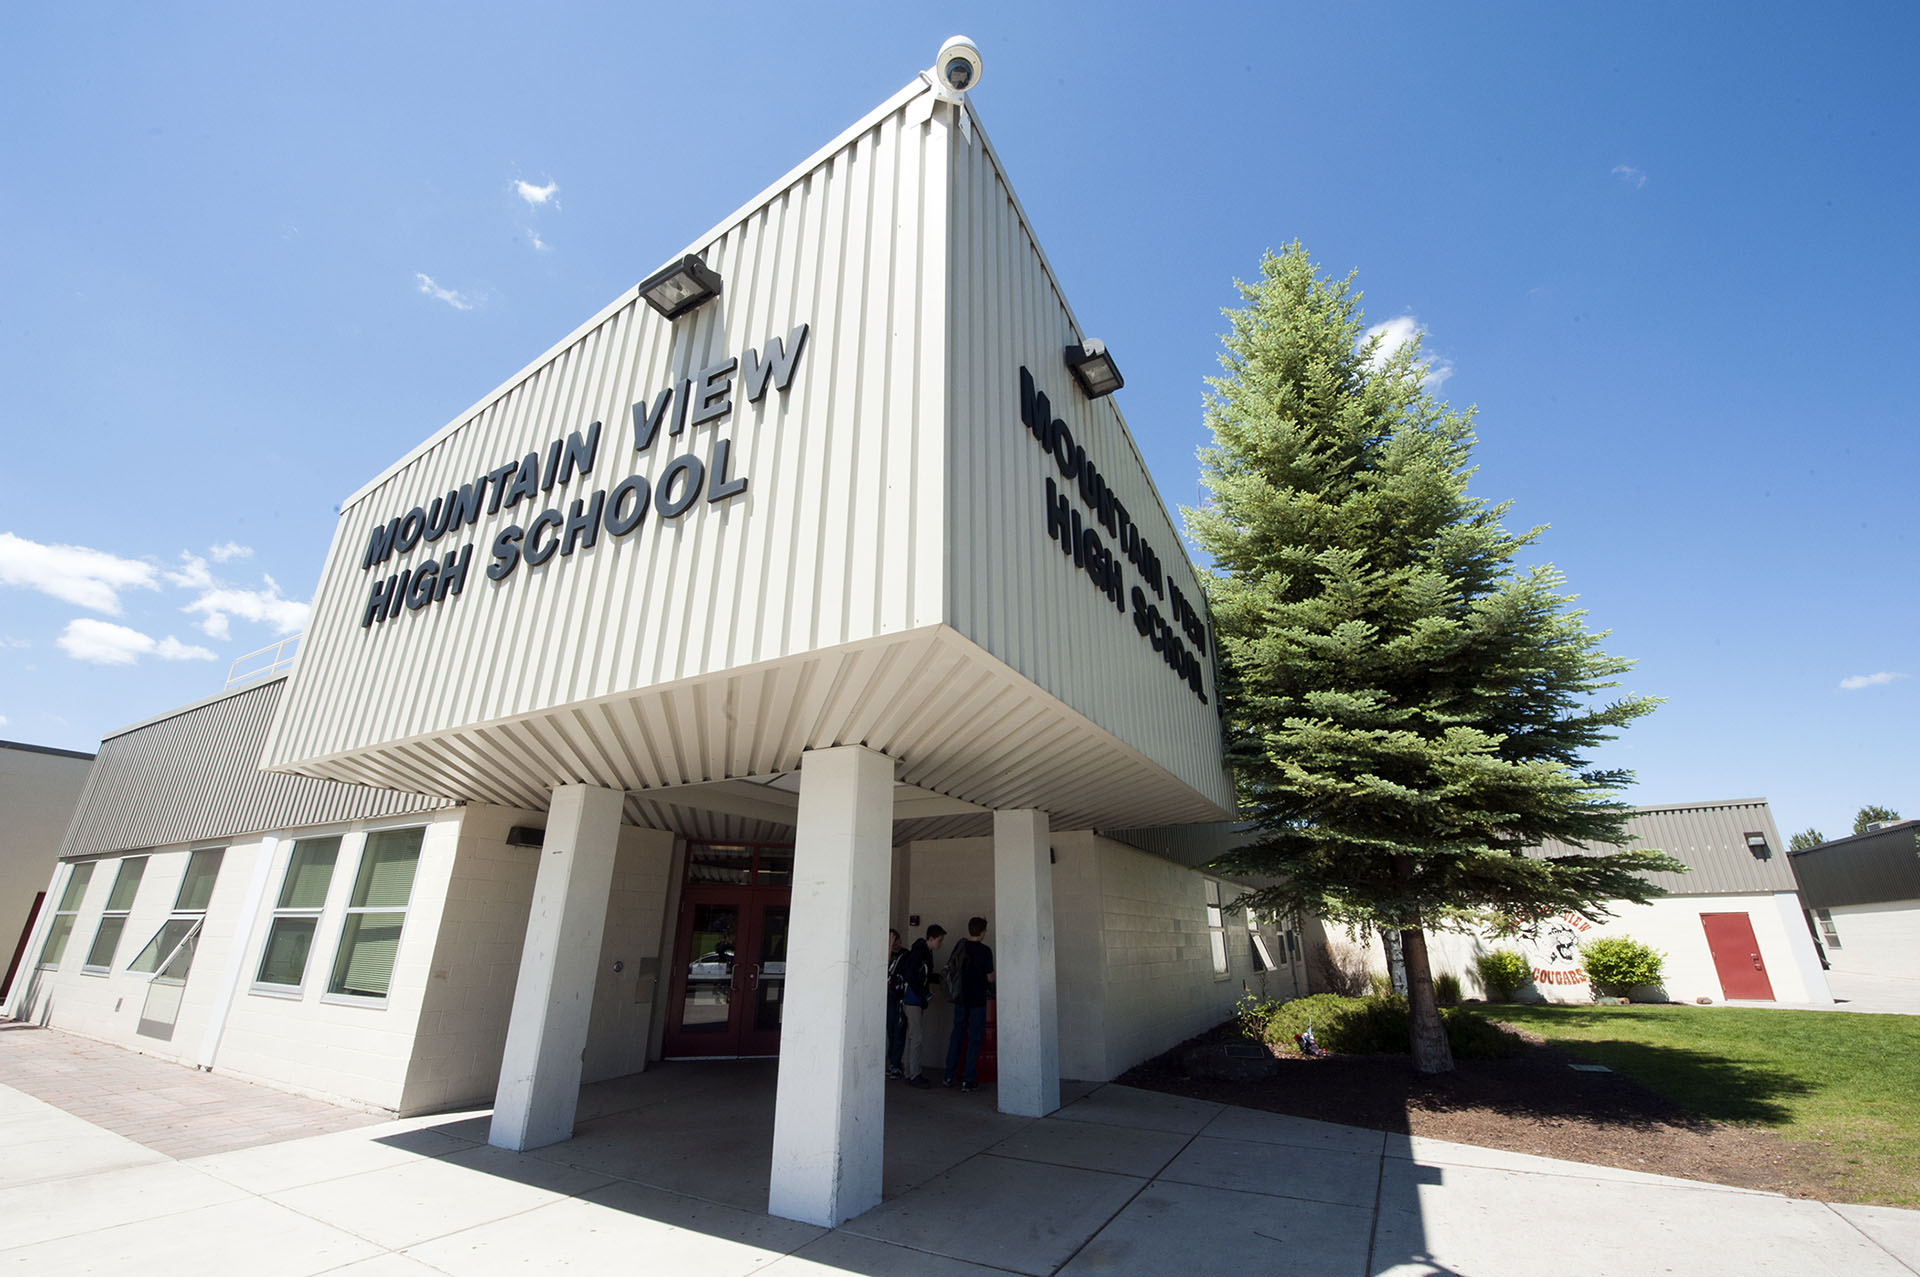 Mountain View High School Bend